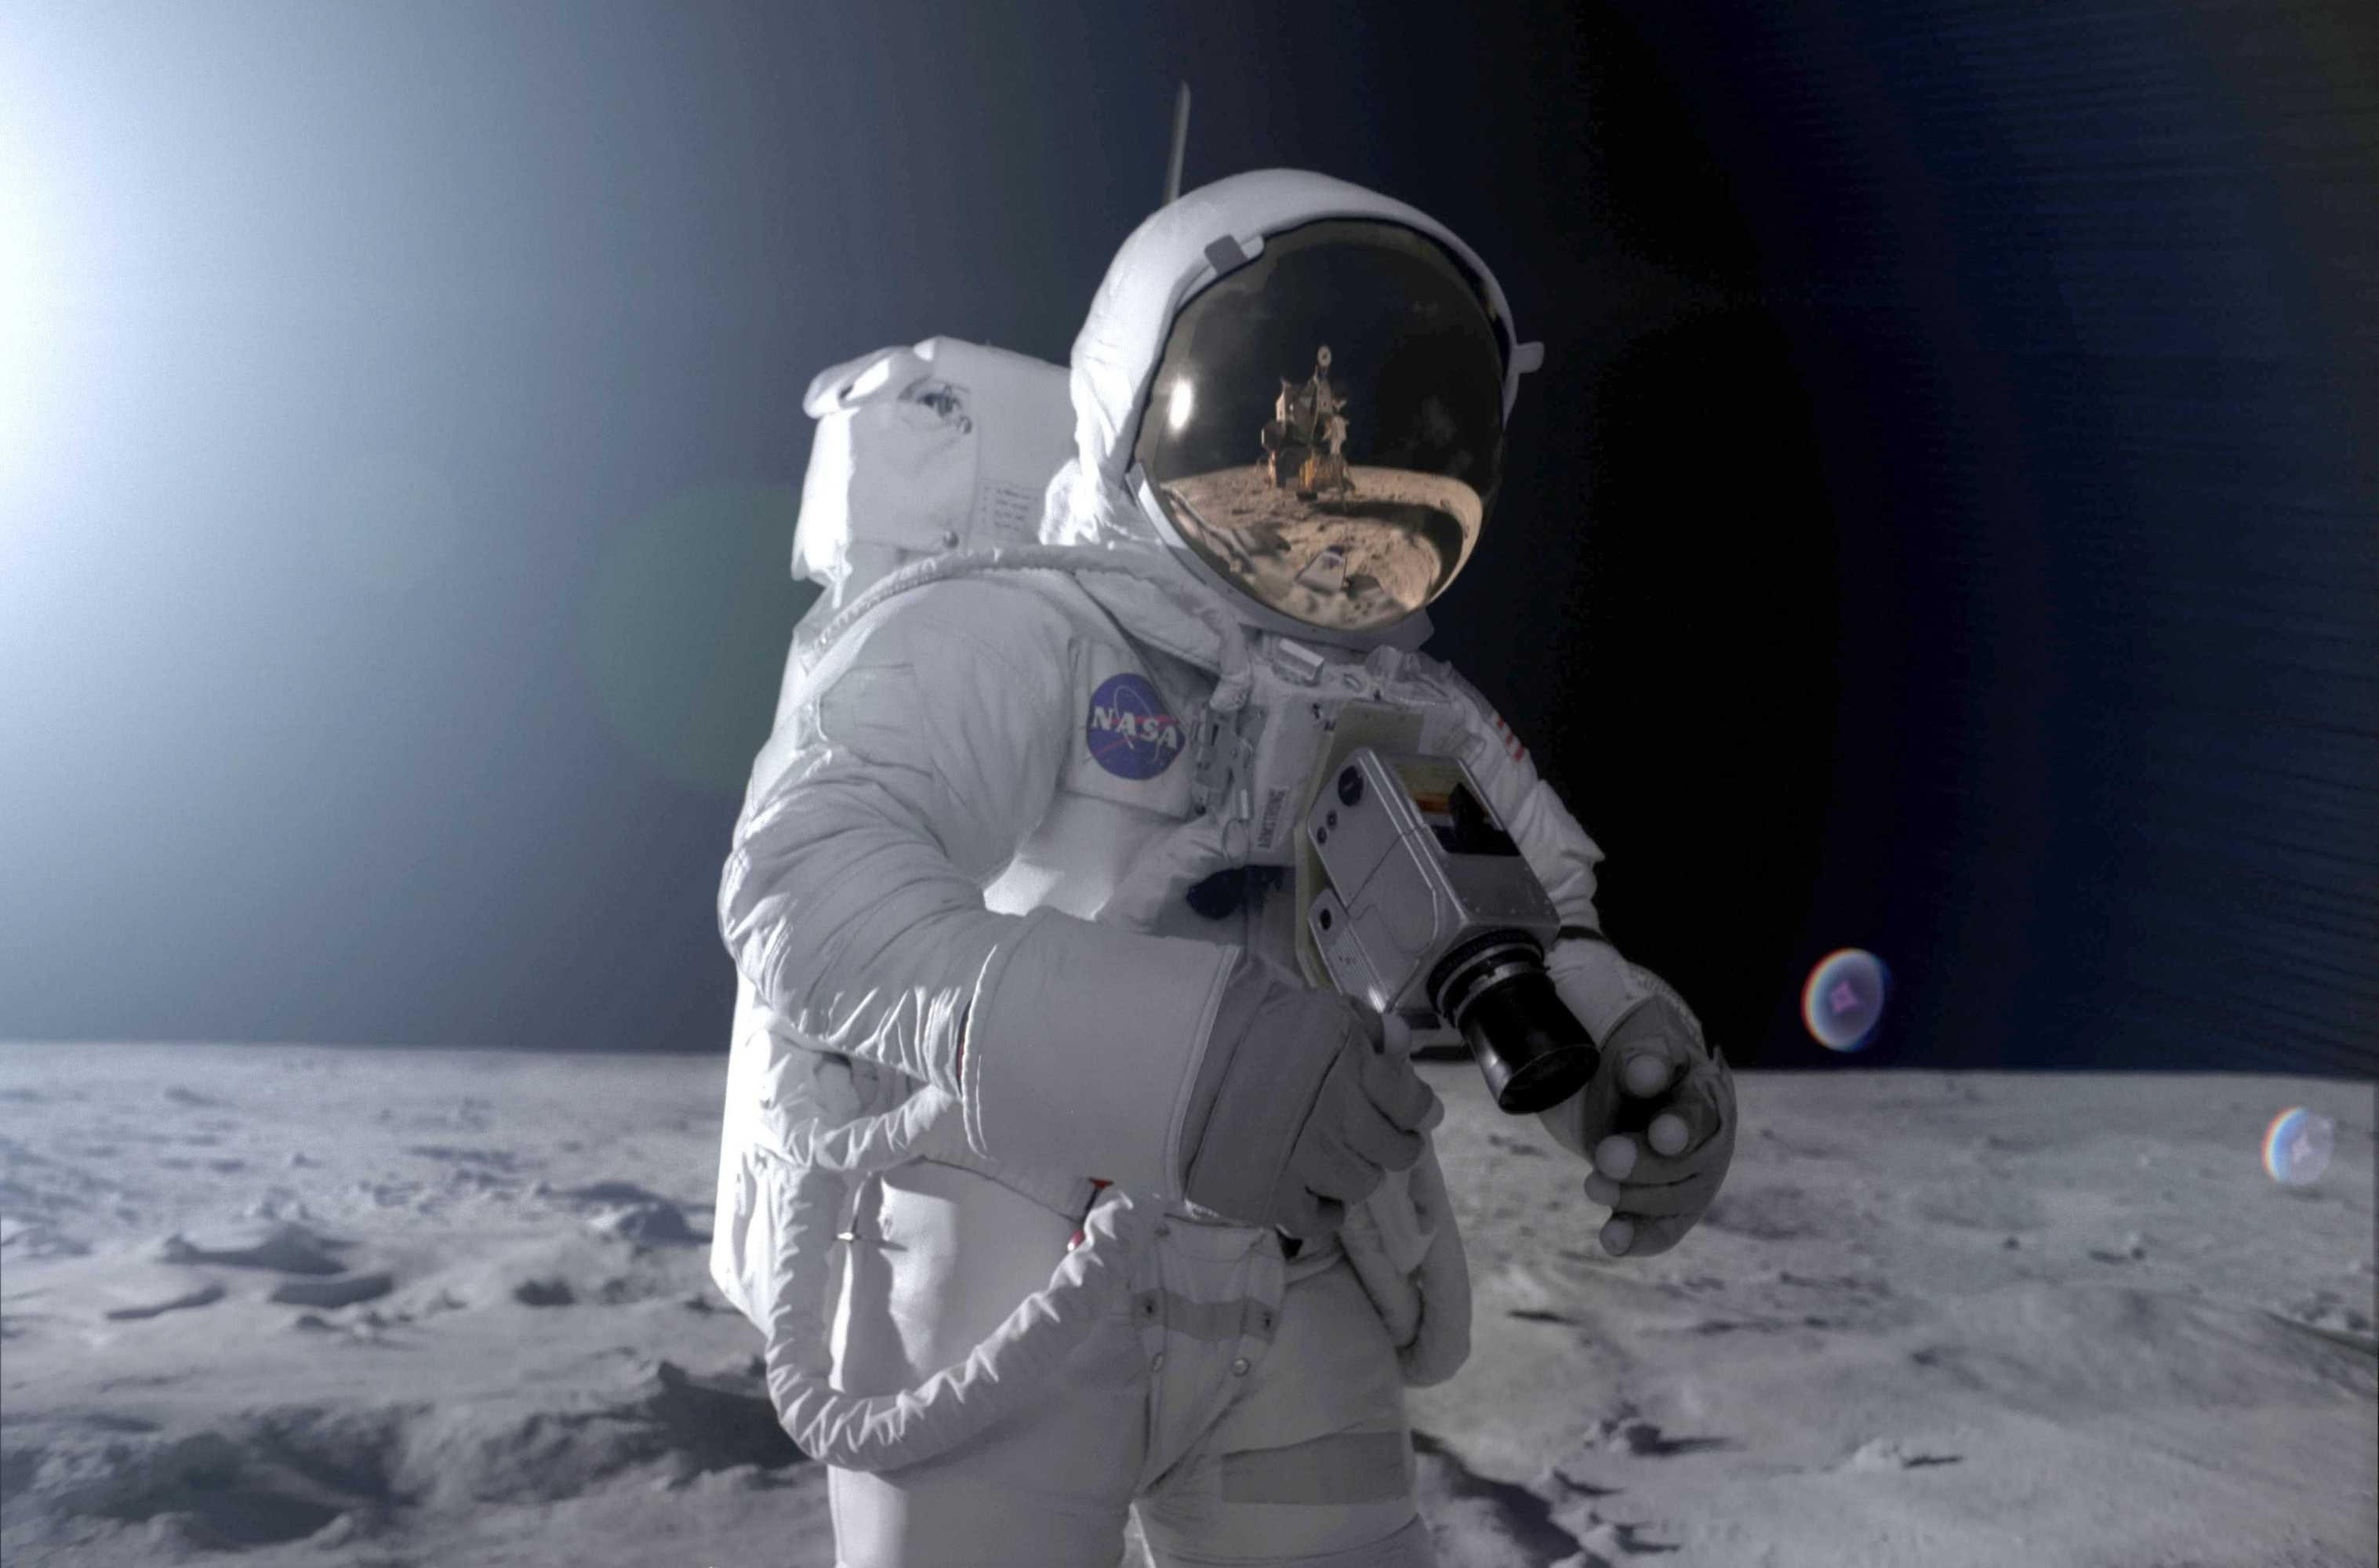 astronaut moon hd pics - photo #7